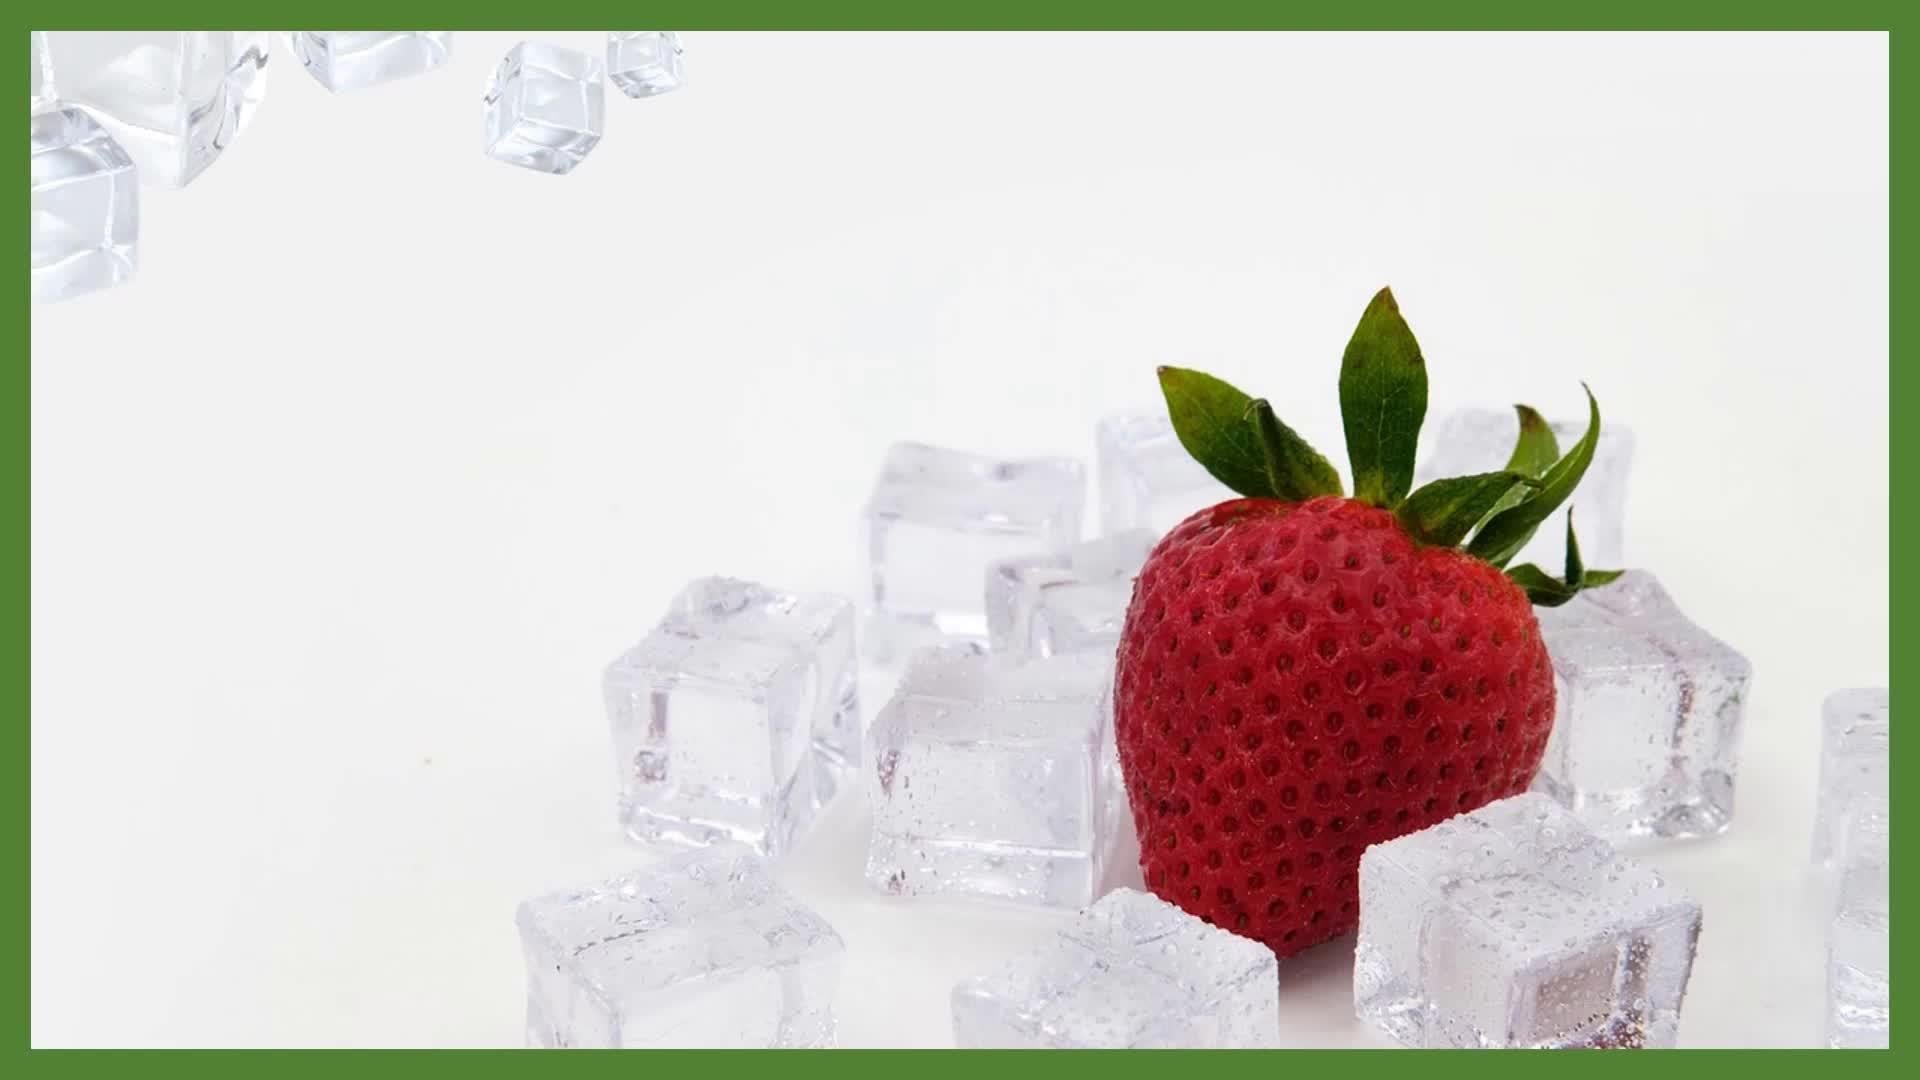 Yüksek kalite krom Kaplama Ezilmiş Buz Buz Pick